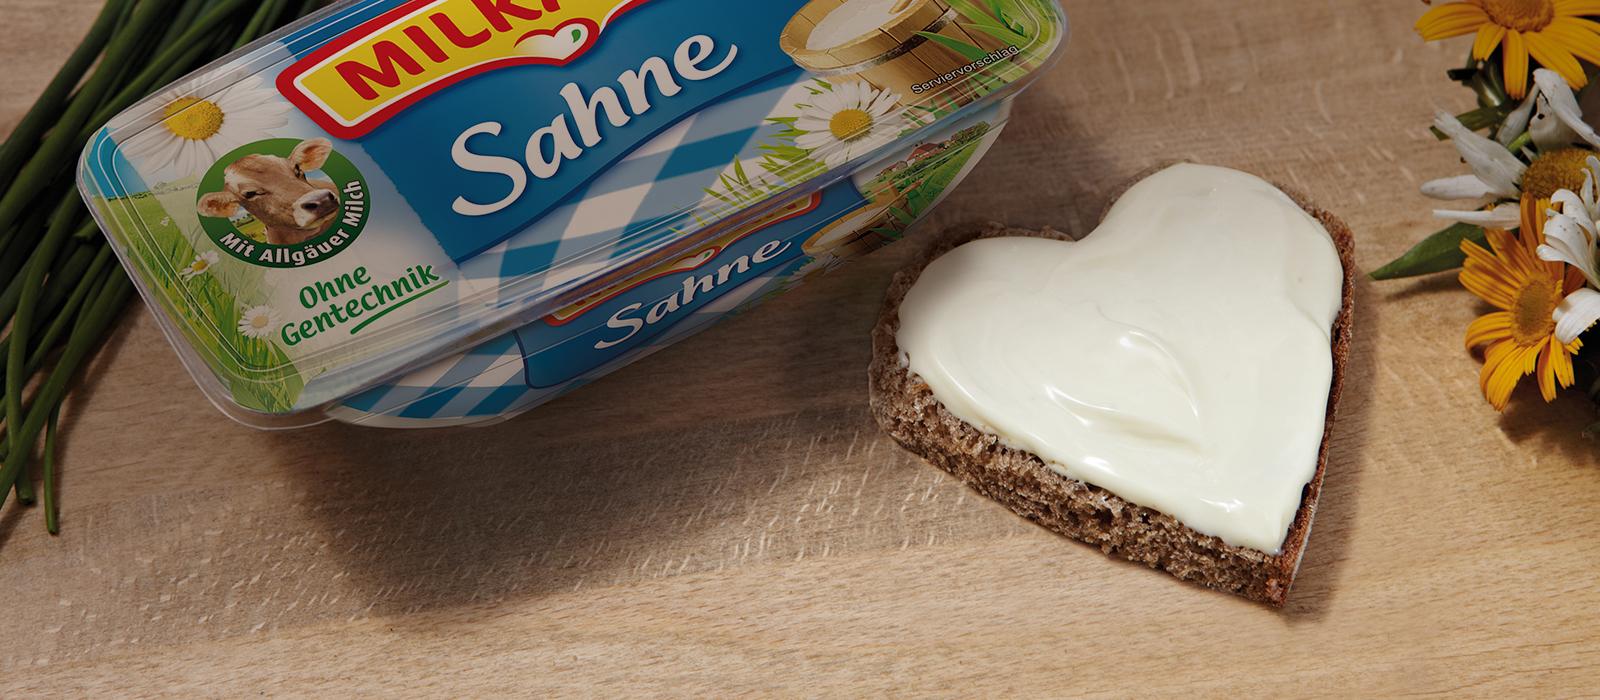 Milkana Herz Brot Frischeschale Sahne